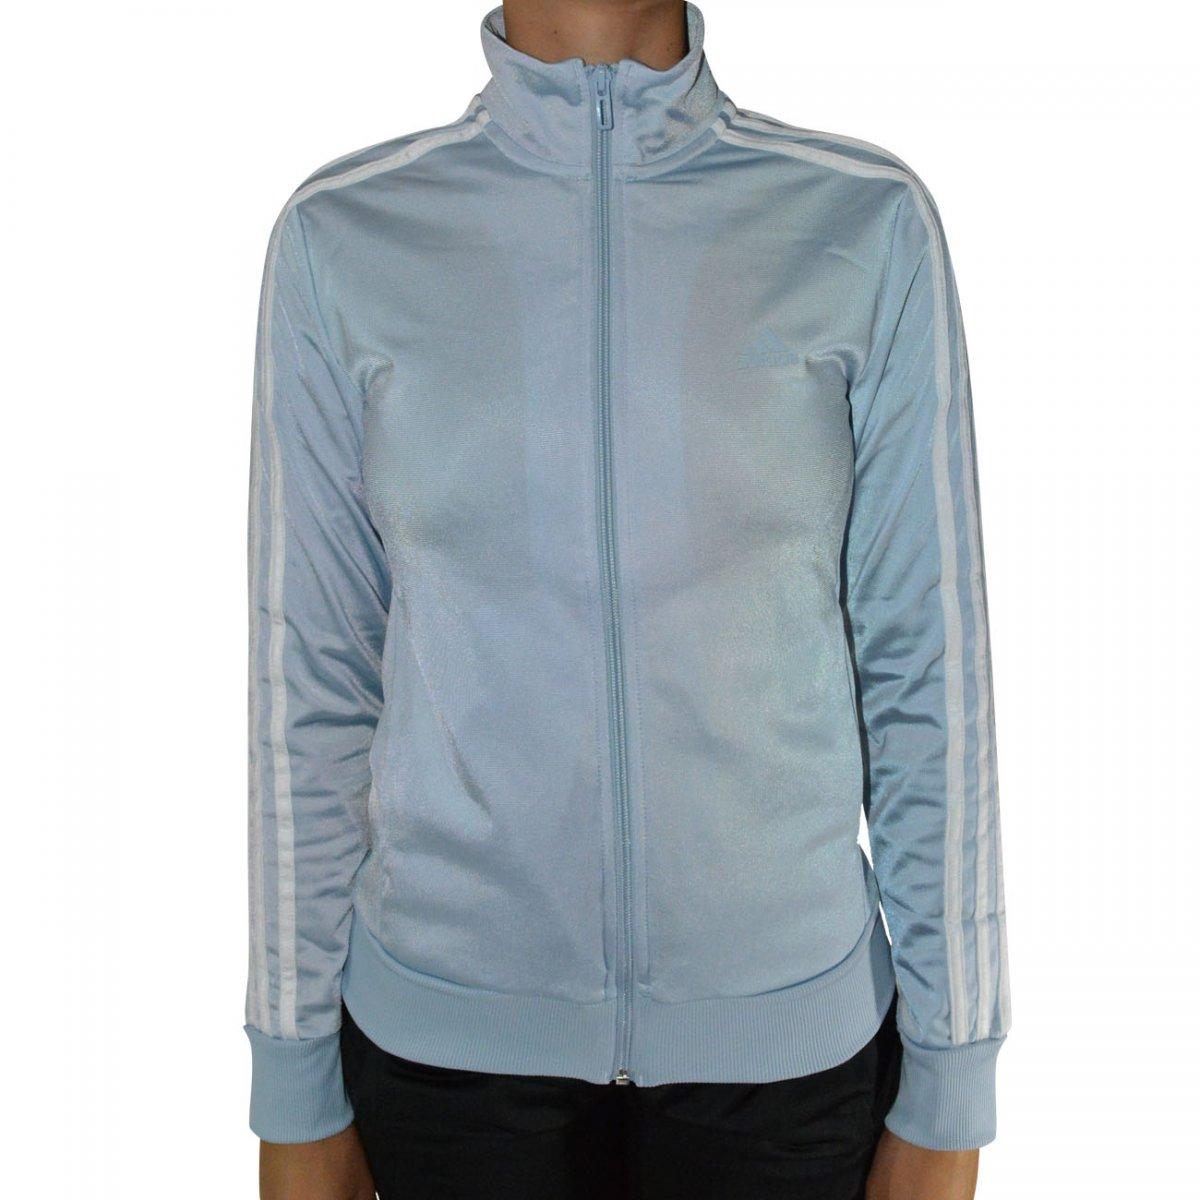 Agasalho Adidas W KN TS 1 Feminino BP8271 - Azul Bebe Preto - Chuteira  Nike 022f68302b3